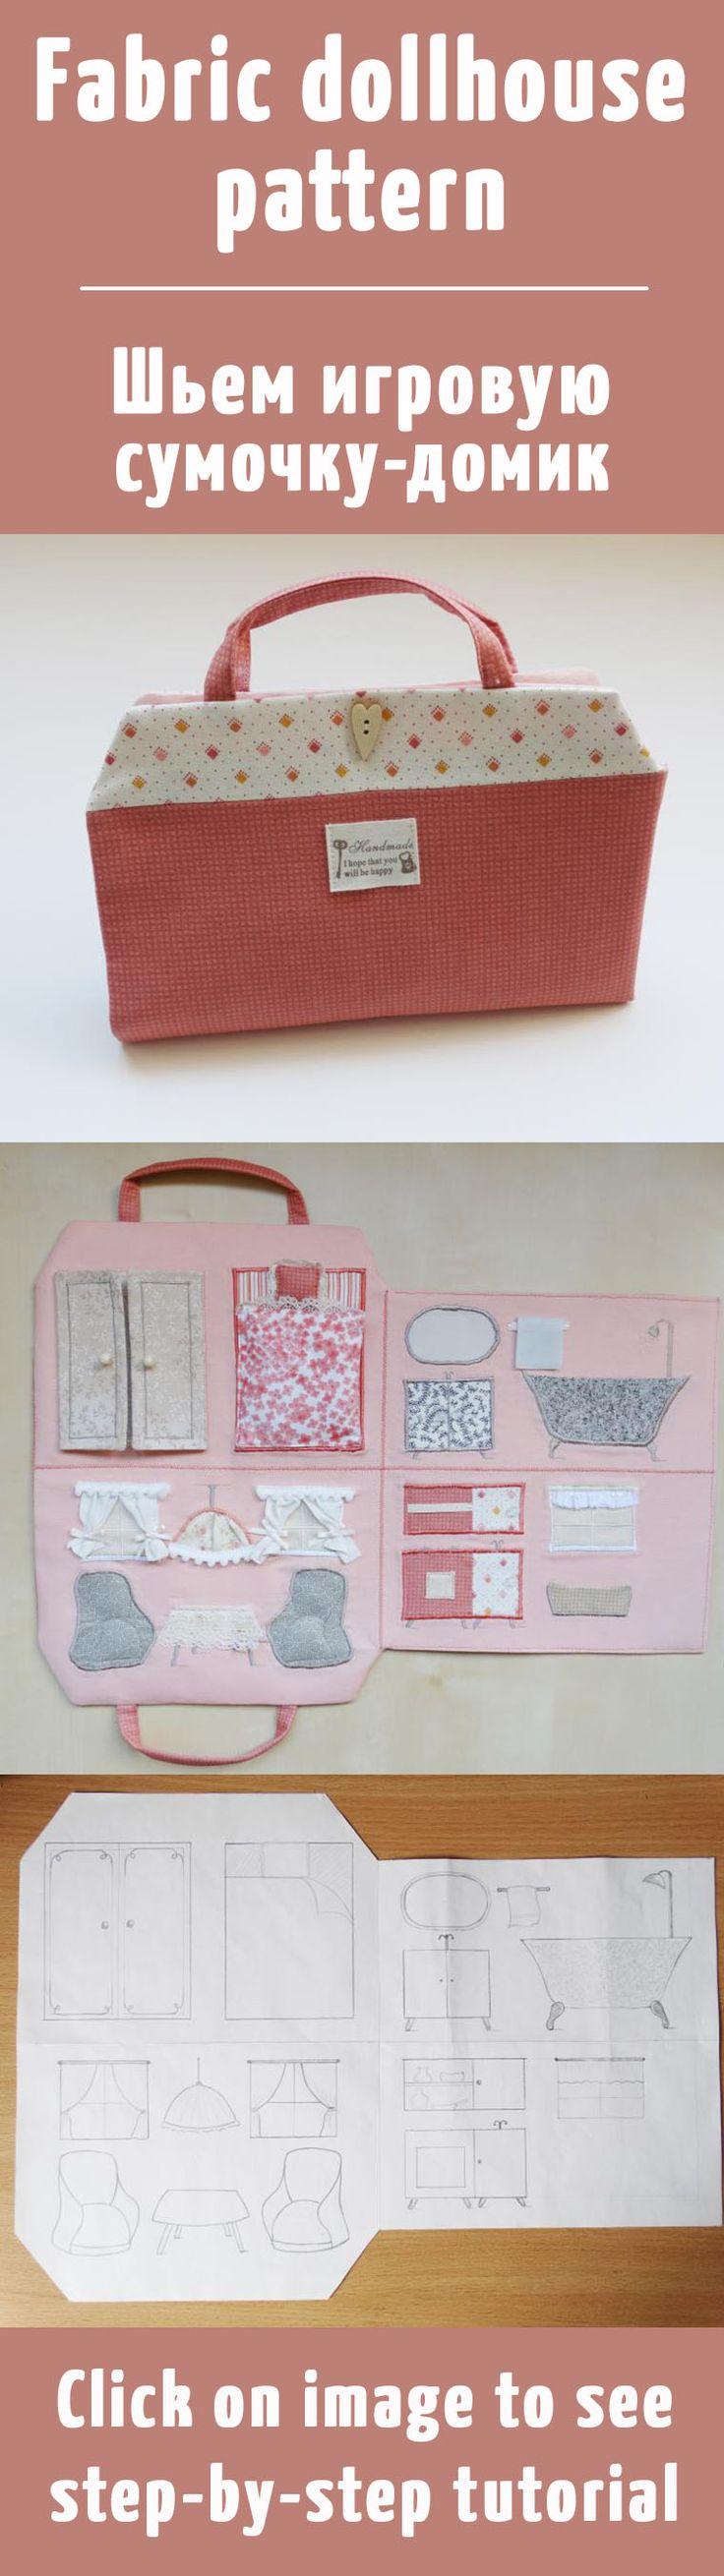 Мастер-класс: шьем игровую сумочку-домик для куклы / Fabric dollhouse pattern #handmade #tutorial #сделайсам #МК